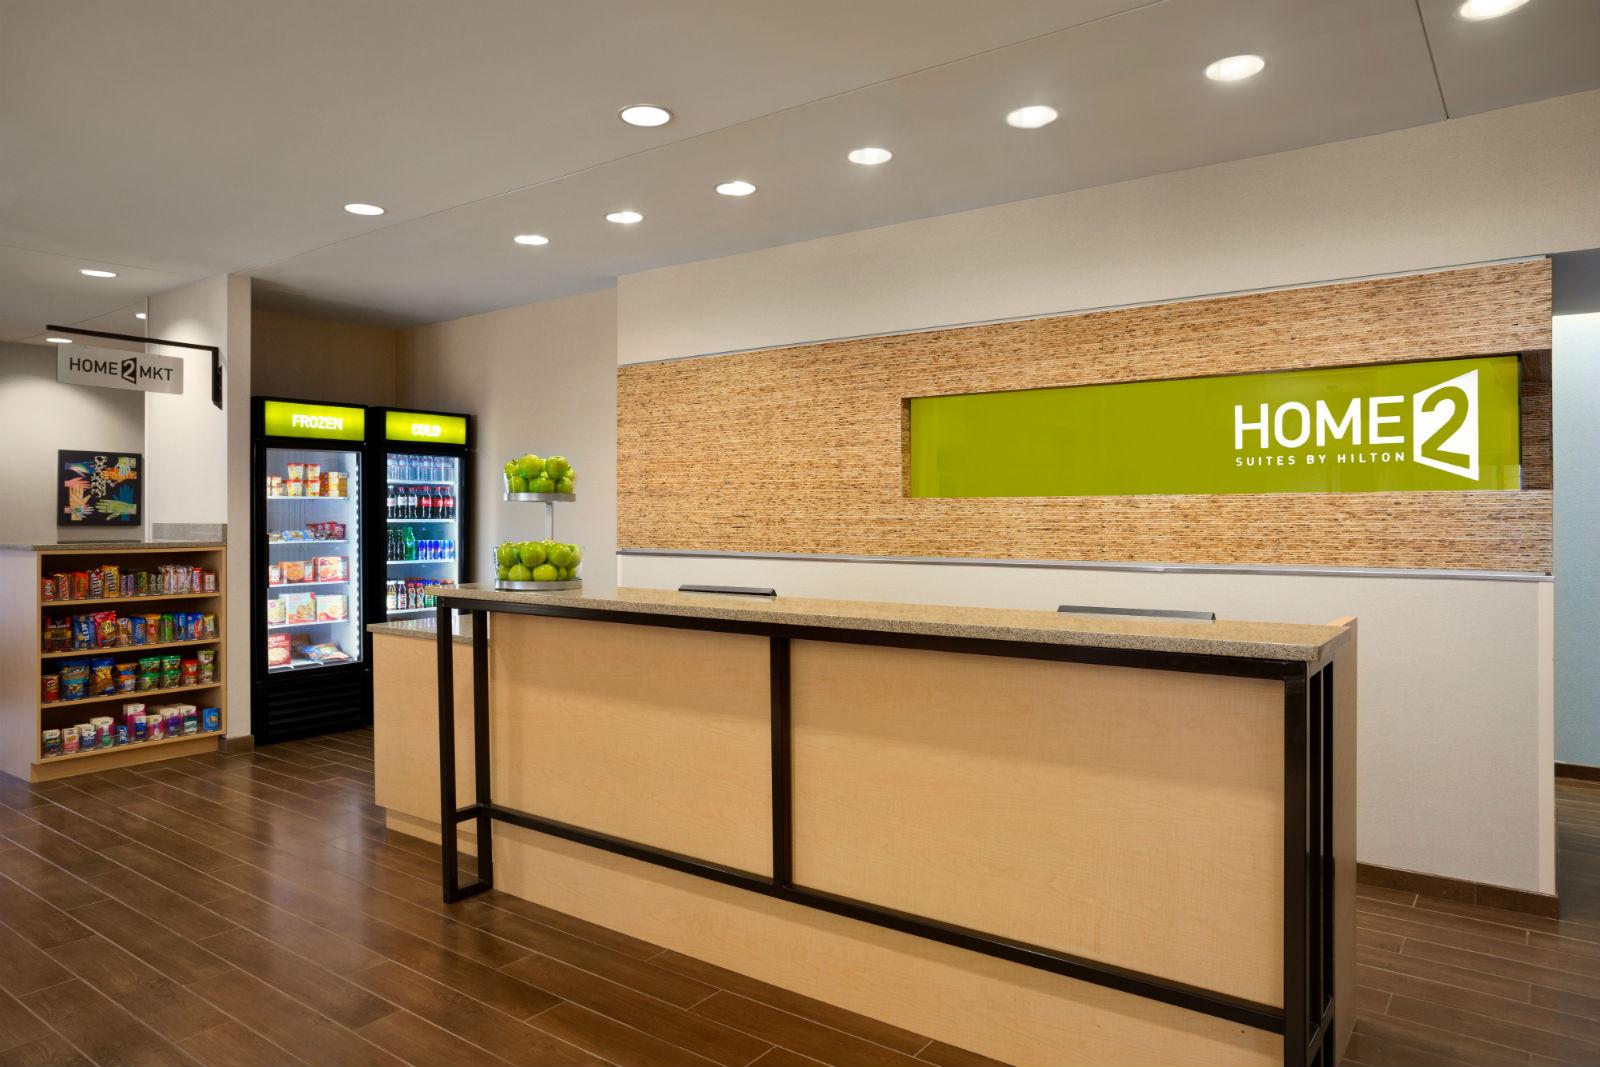 Home2-Market-937488157